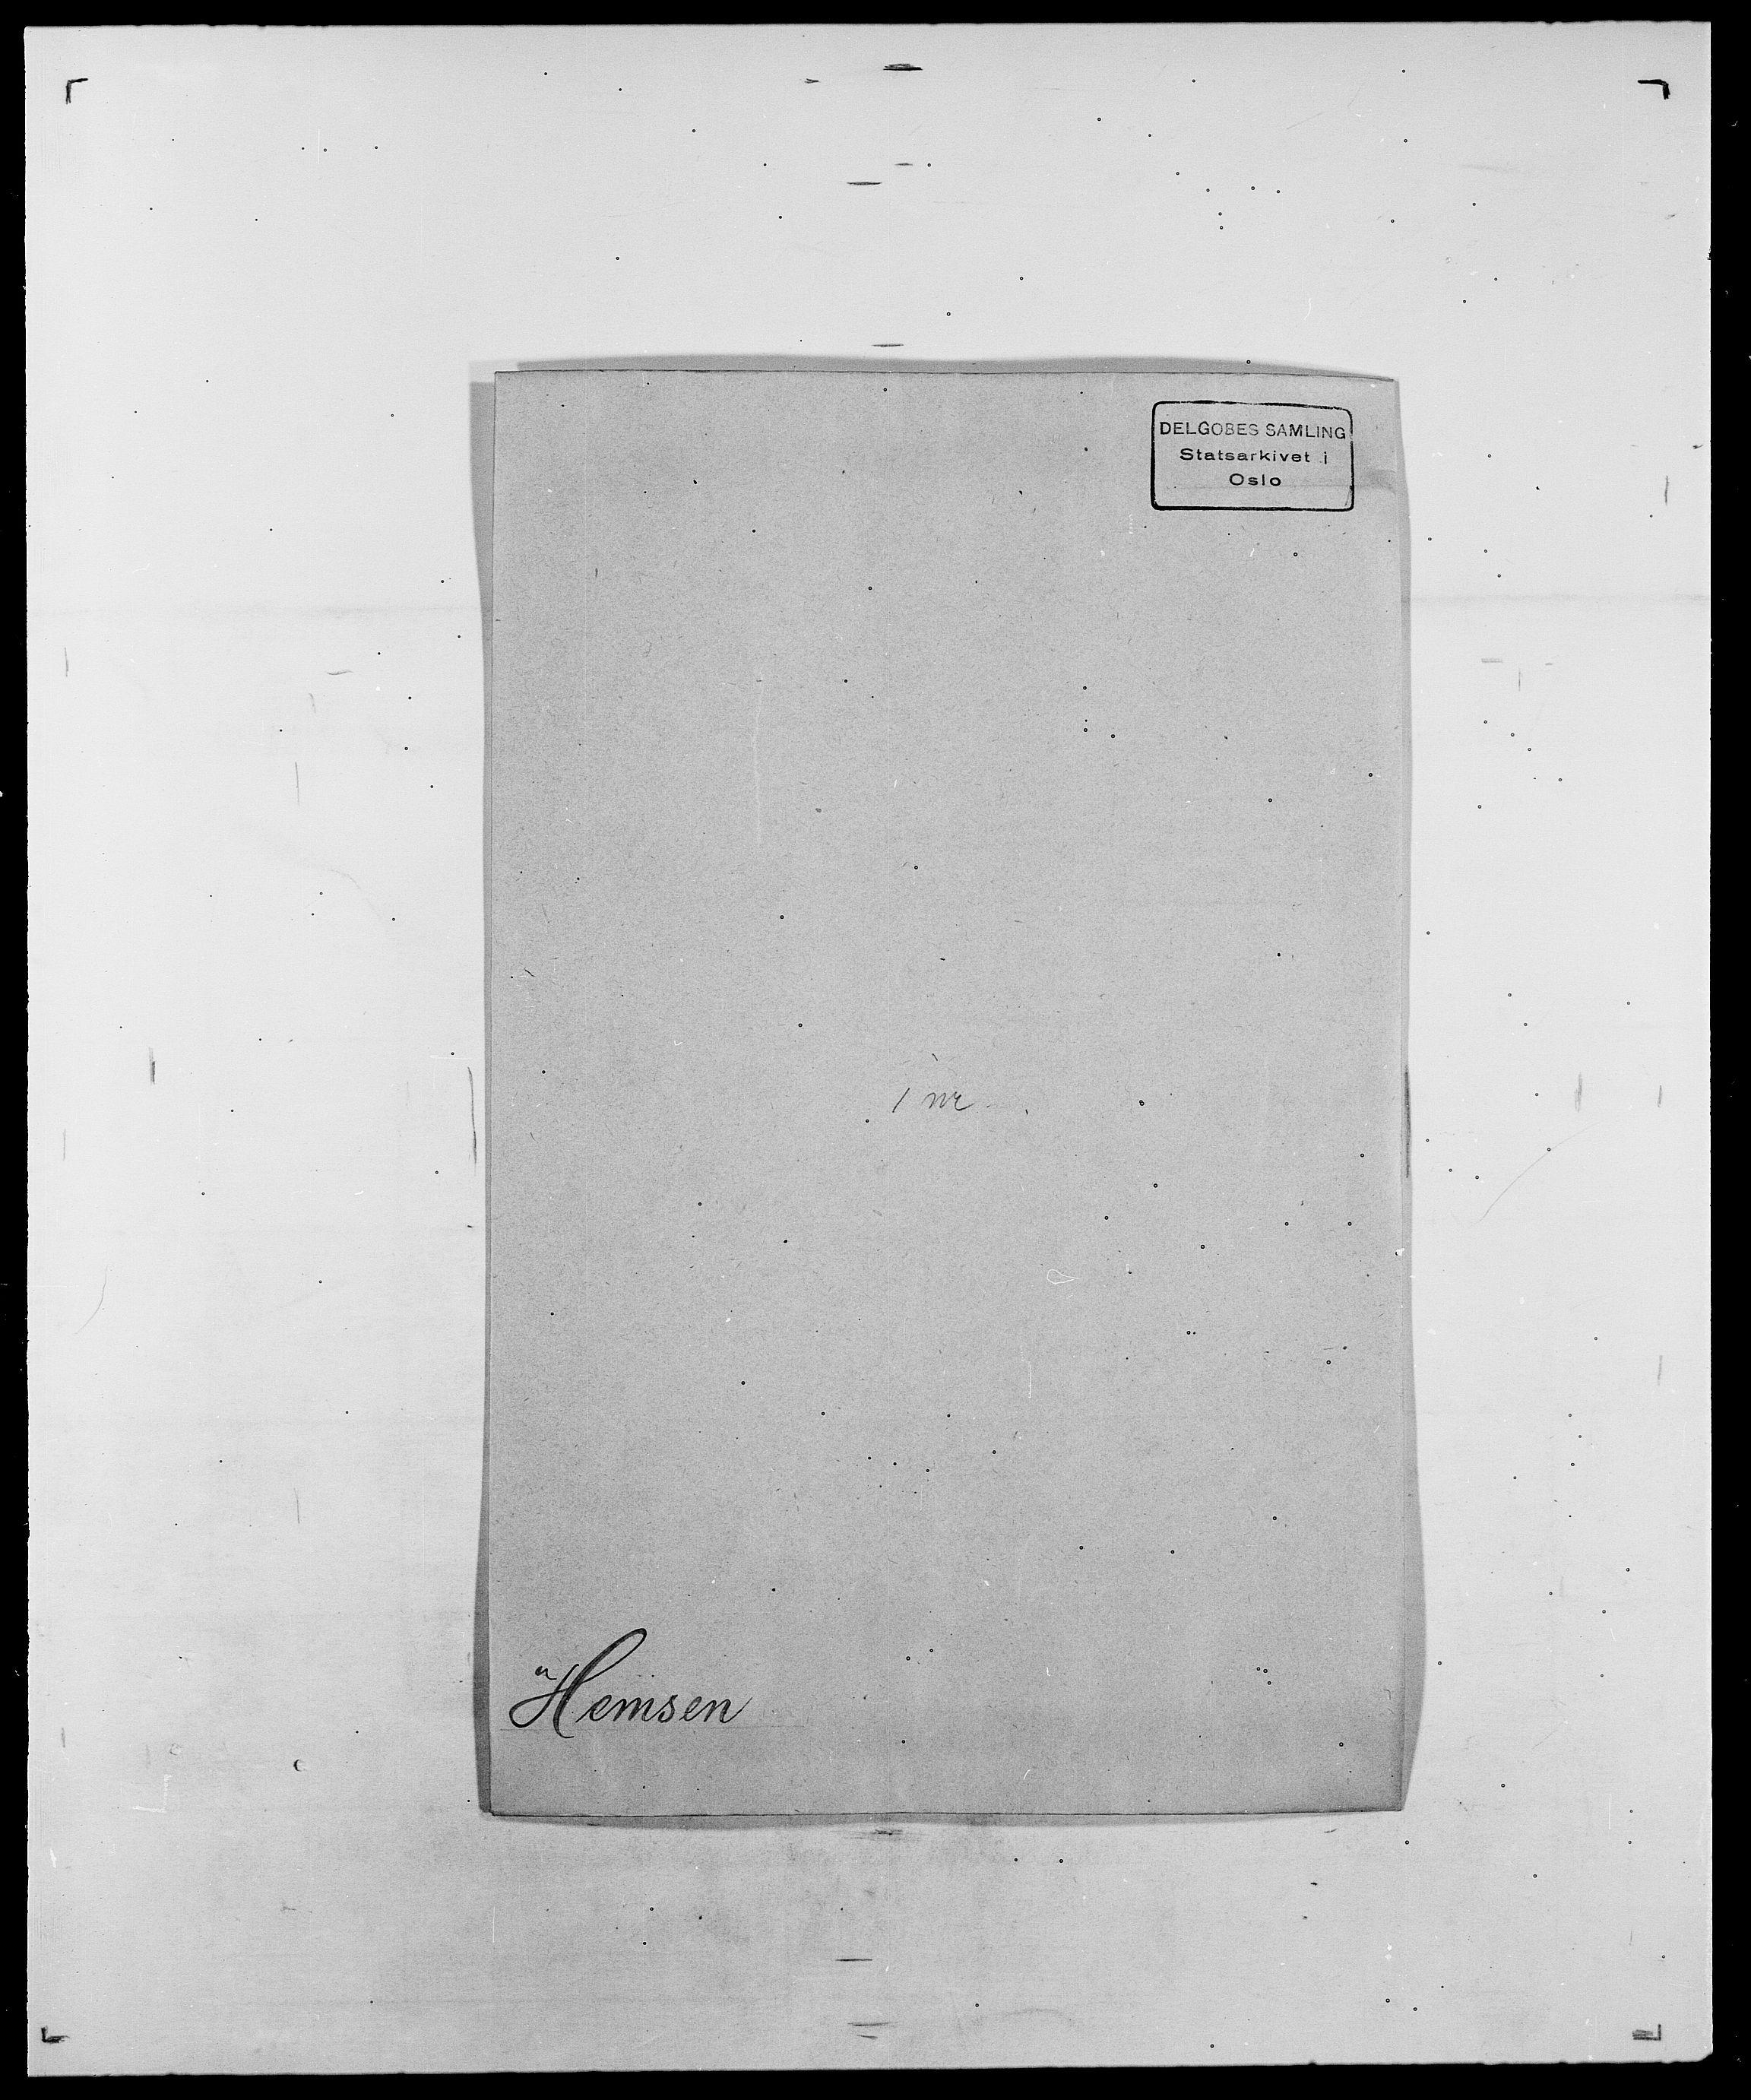 SAO, Delgobe, Charles Antoine - samling, D/Da/L0017: Helander - Hjørne, s. 167